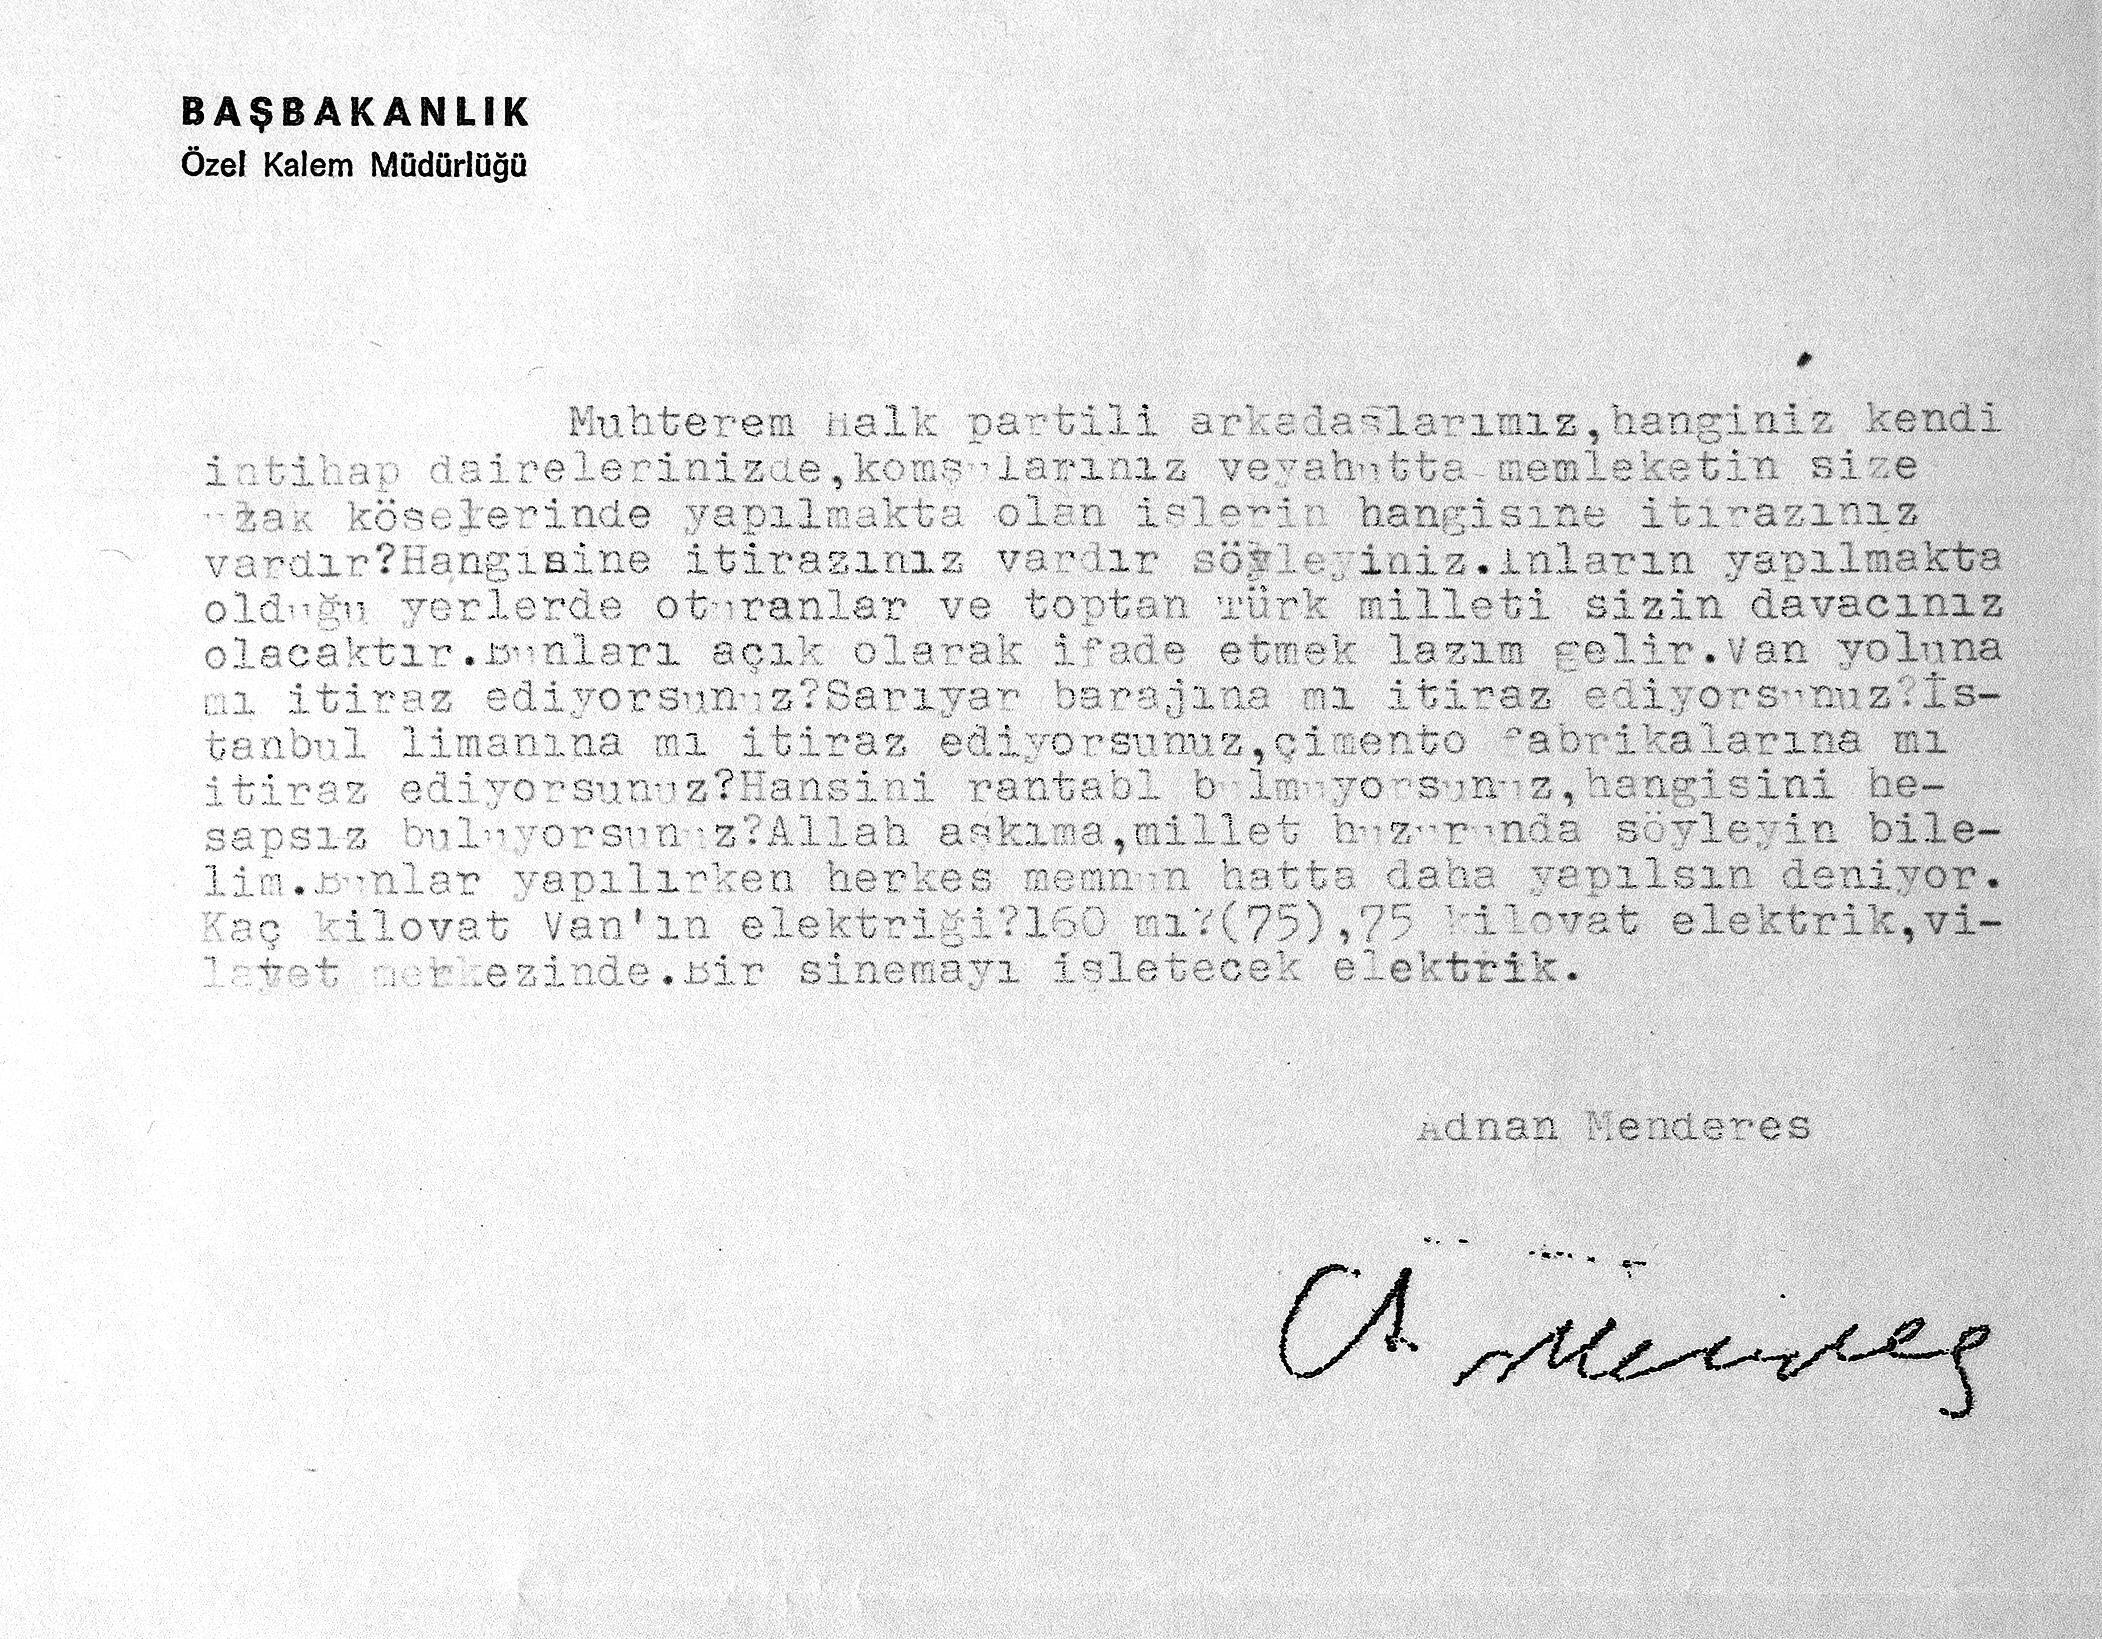 Adnan Menderes imzalı belge